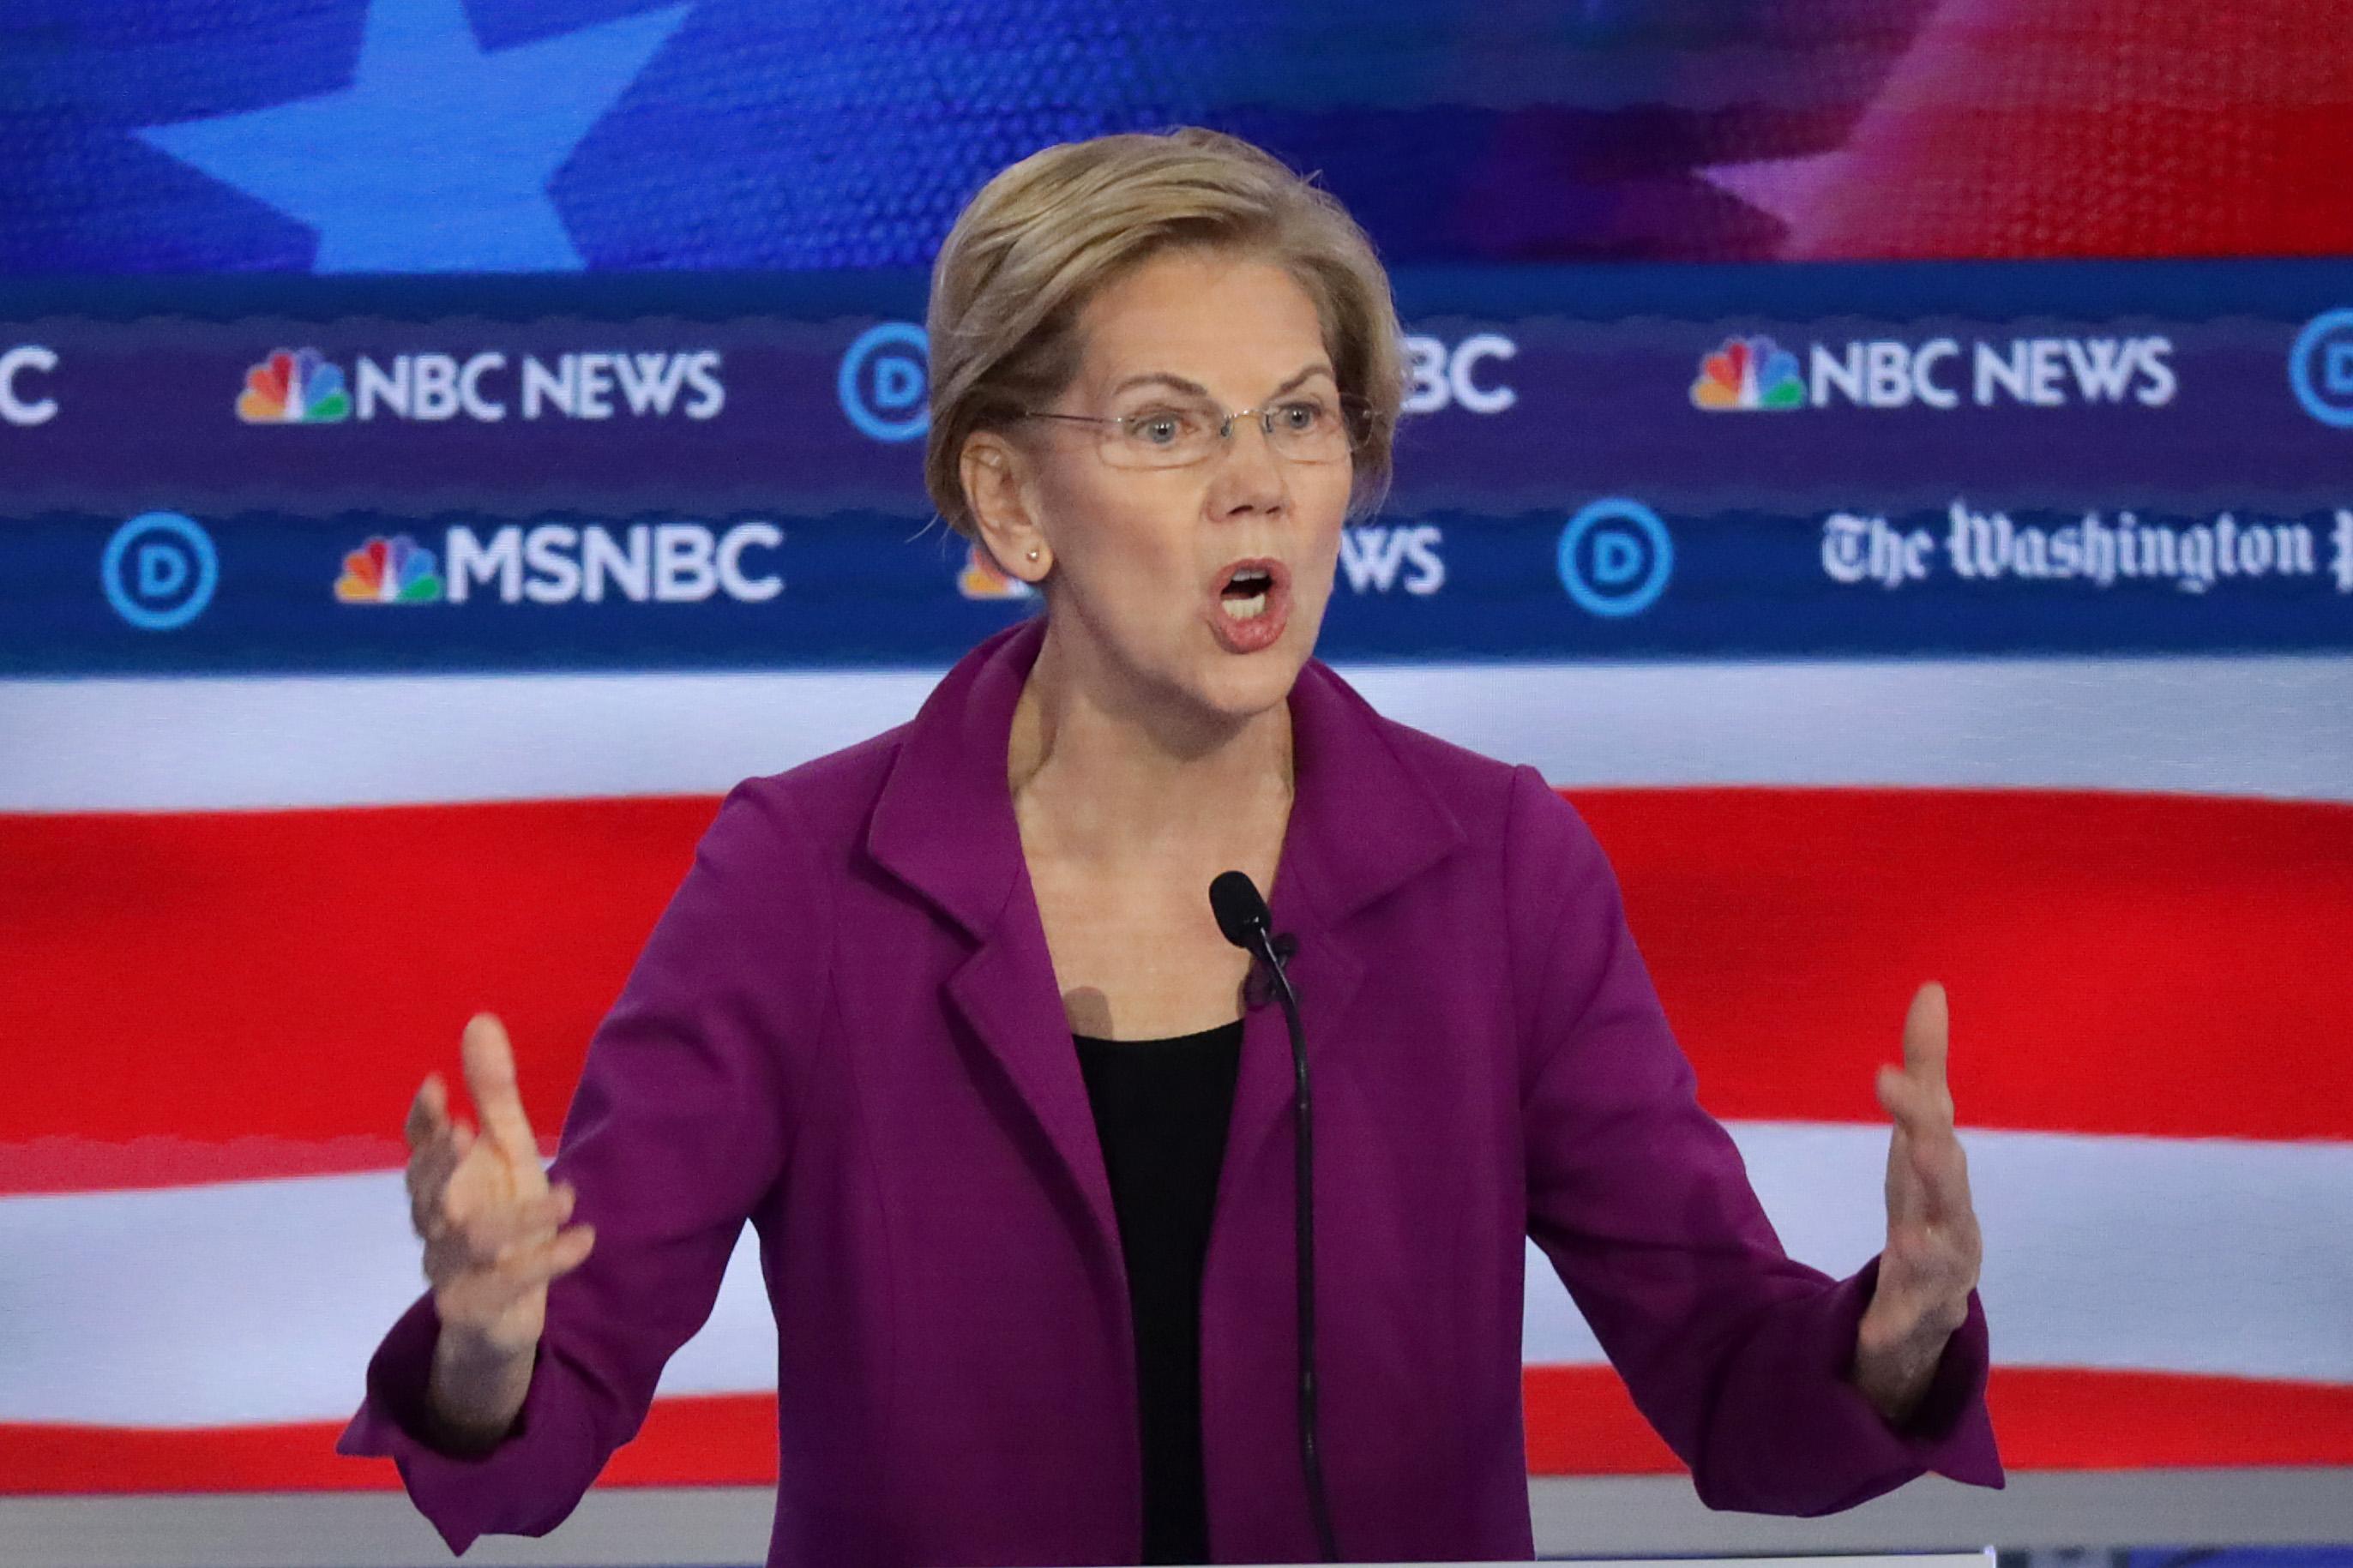 Sen. Elizabeth Warren (D-MA) speaks during the Democratic Presidential Debate at Tyler Perry Studios November 20, 2019 in Atlanta, Georgia. (Alex Wong/Getty Images)